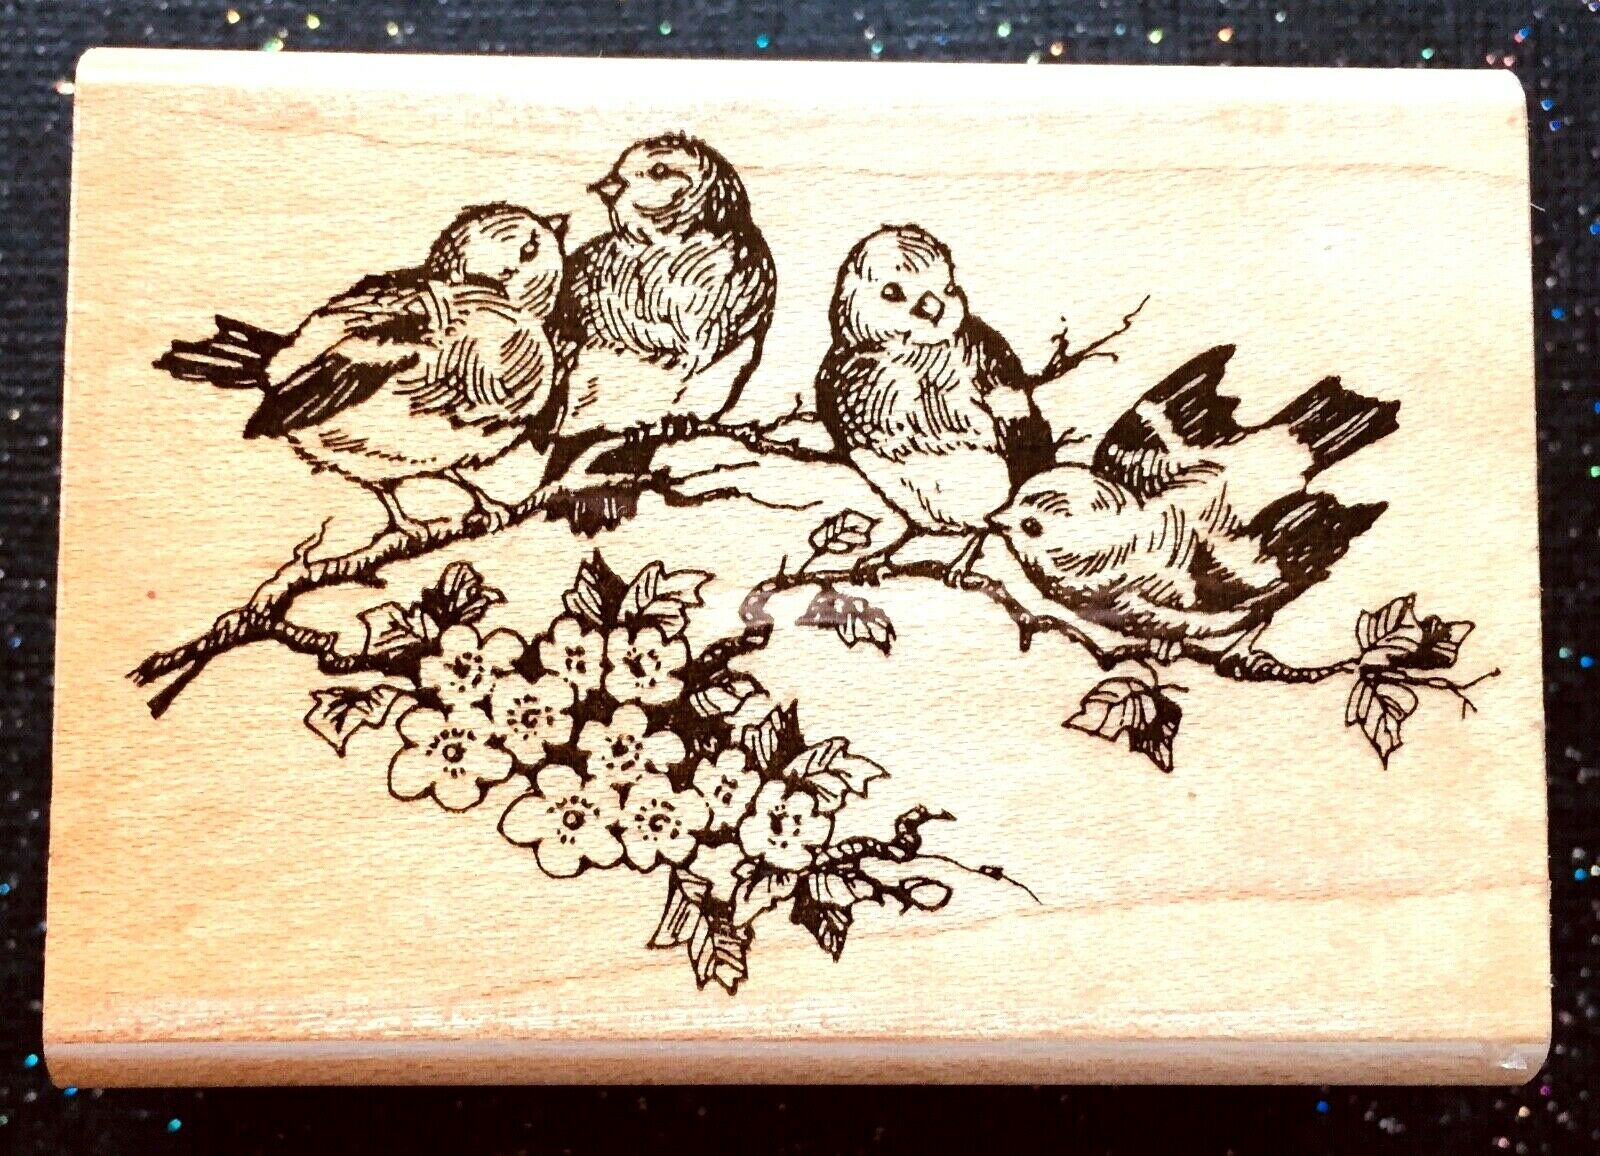 Vintage Rubber Stamp Blue Bird Chatter Stampendous 1 3/4 X 2 1/2  - $5.50